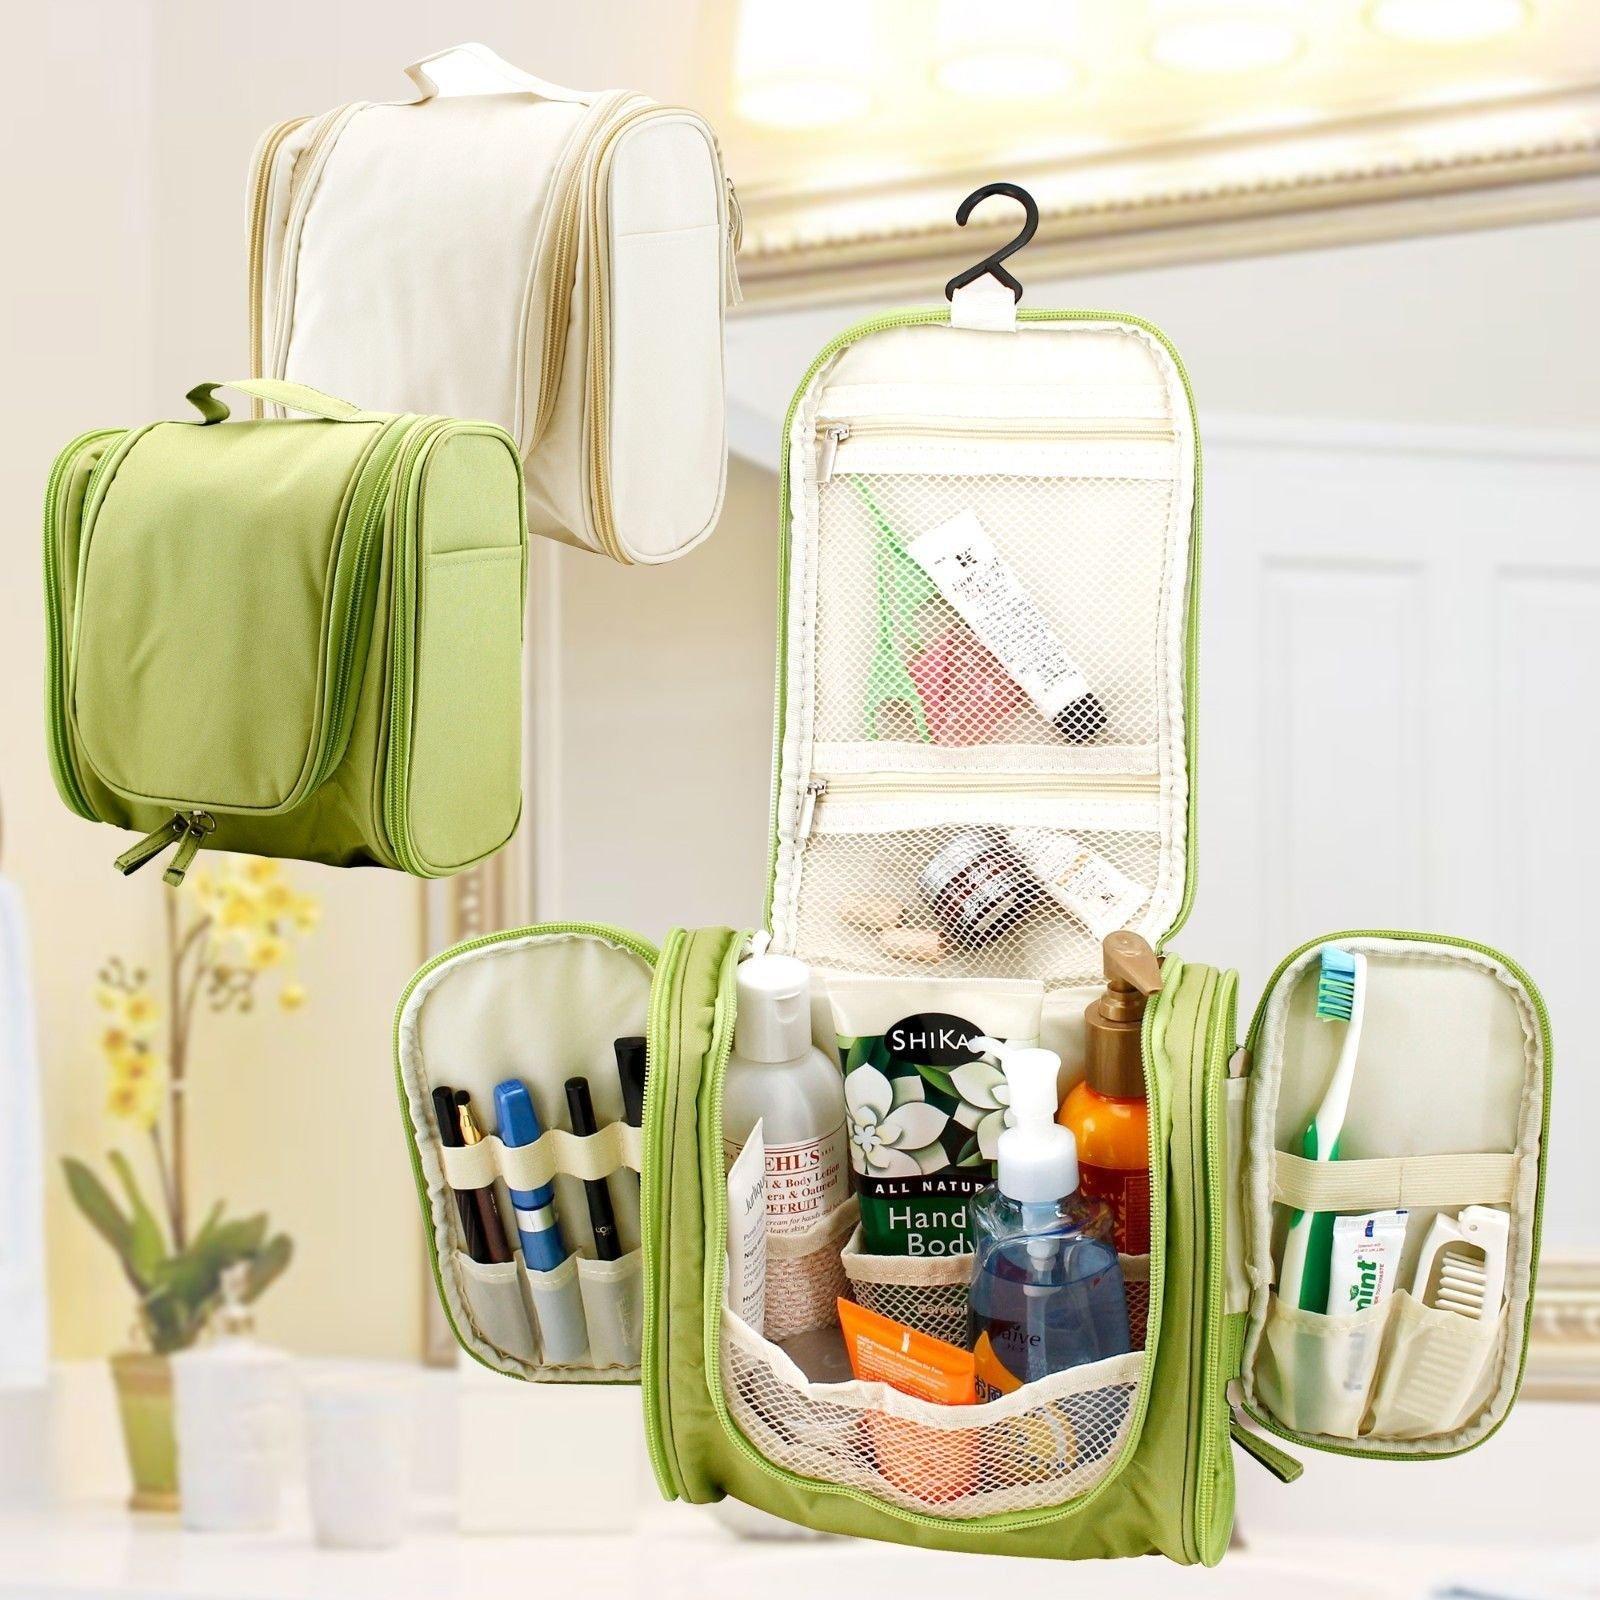 Generic YC-US2-160428-120 <8&35621> Kit Bagtry Cosmeti Cosmetics Medicine Travel Organizer MakeUp Shaving Accessory Toiletry Kit Bag Travel Orga